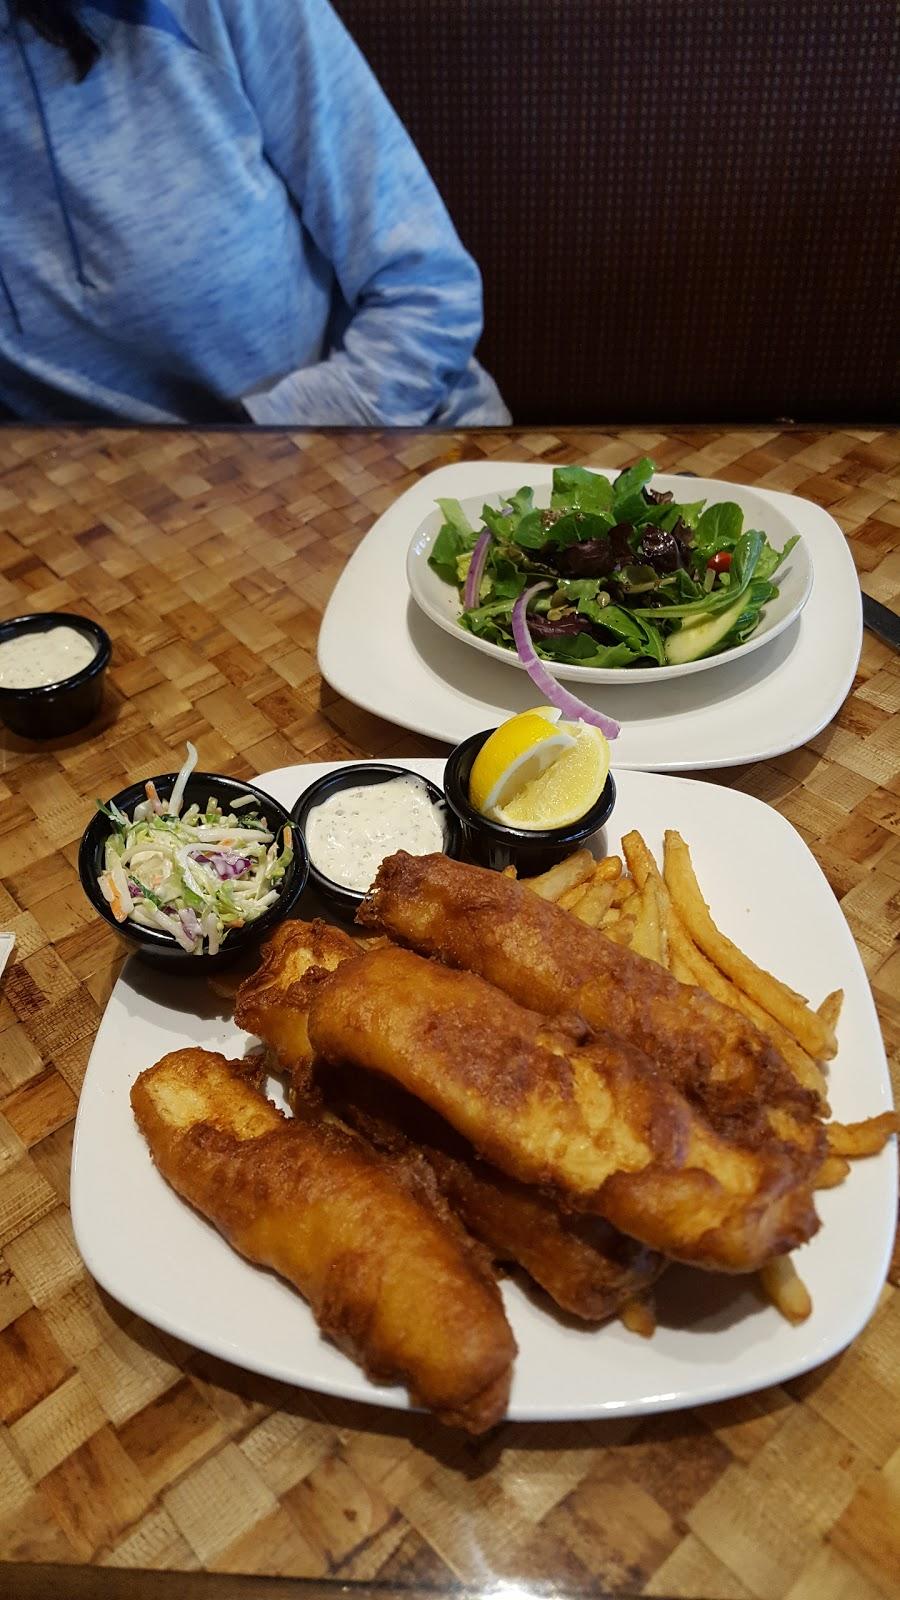 Islamorada Fish Company - restaurant  | Photo 5 of 10 | Address: 5001 Bass Pro Dr, Garland, TX 75043, USA | Phone: (469) 221-2501